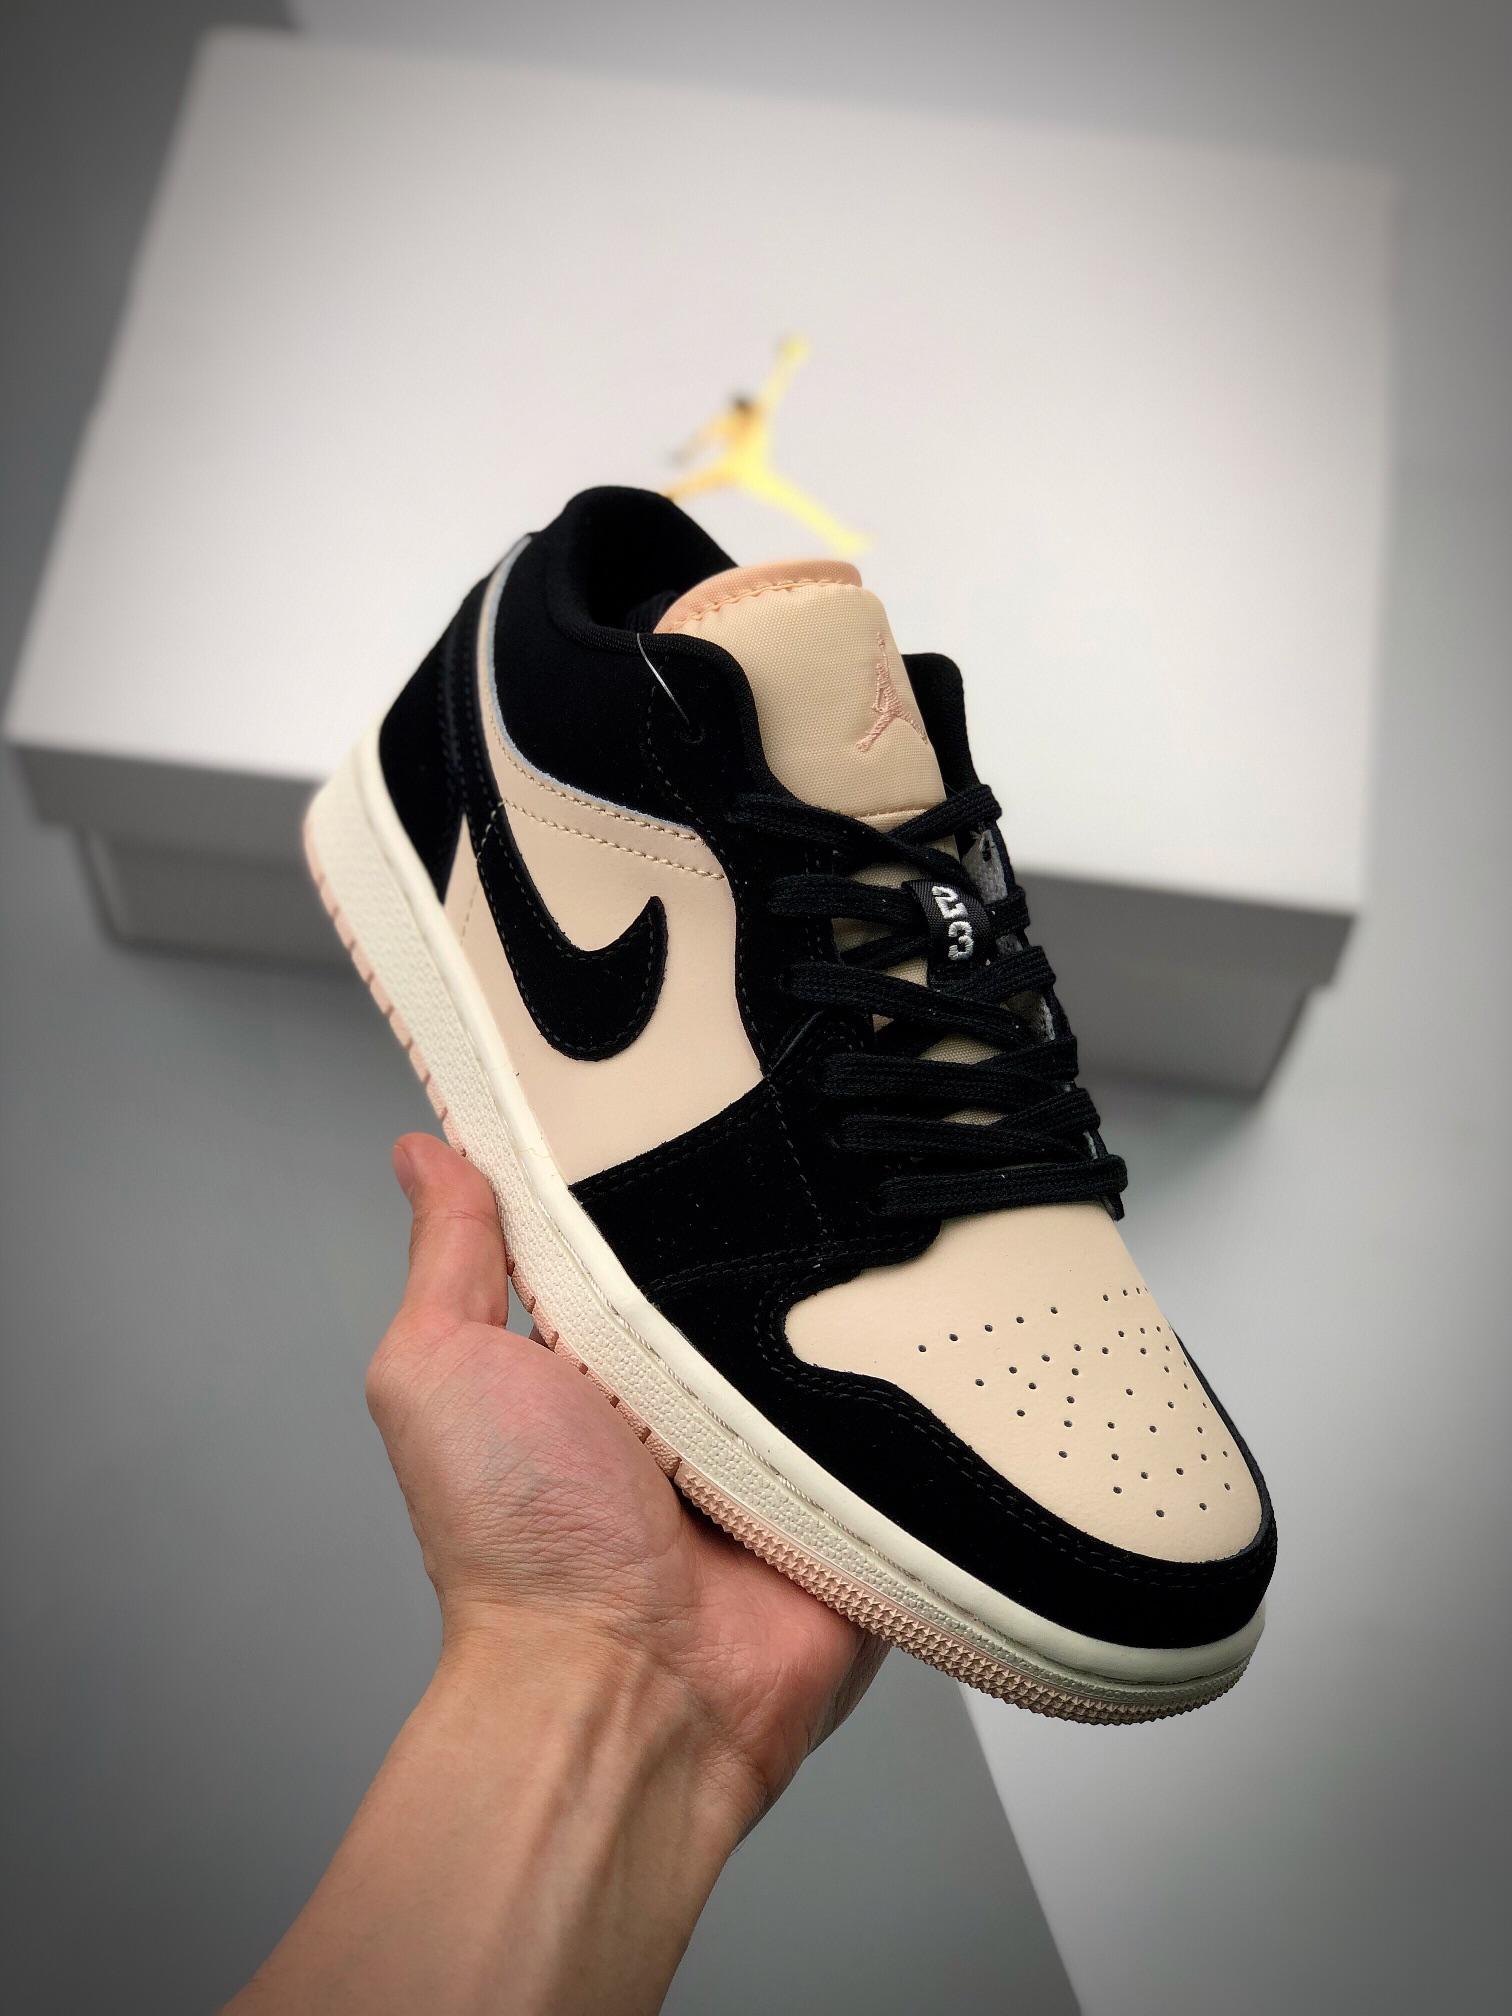 S2低帮low系列 Air Jordan 1 Low 黑粉低帮 秋天的奶茶色 货号:DC0774 003_哪里可以买到最高版本的莆田鞋